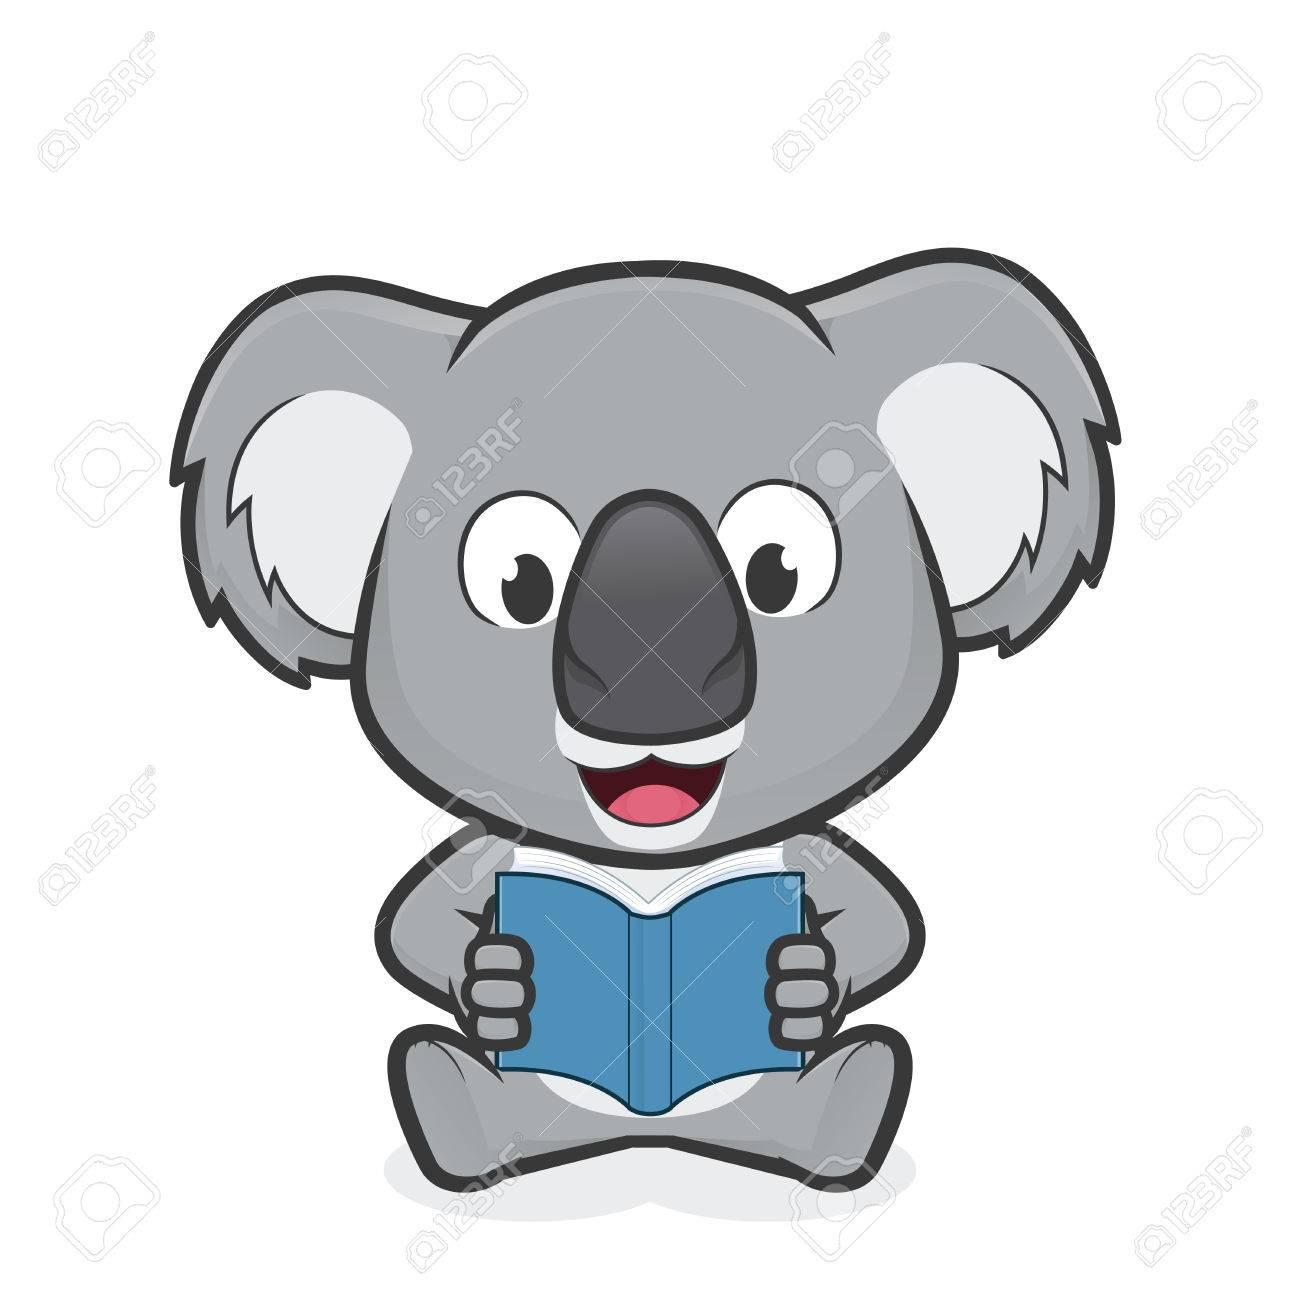 koala reading a book royalty free cliparts vectors and stock rh 123rf com Penguin Clip Art Lion Clip Art